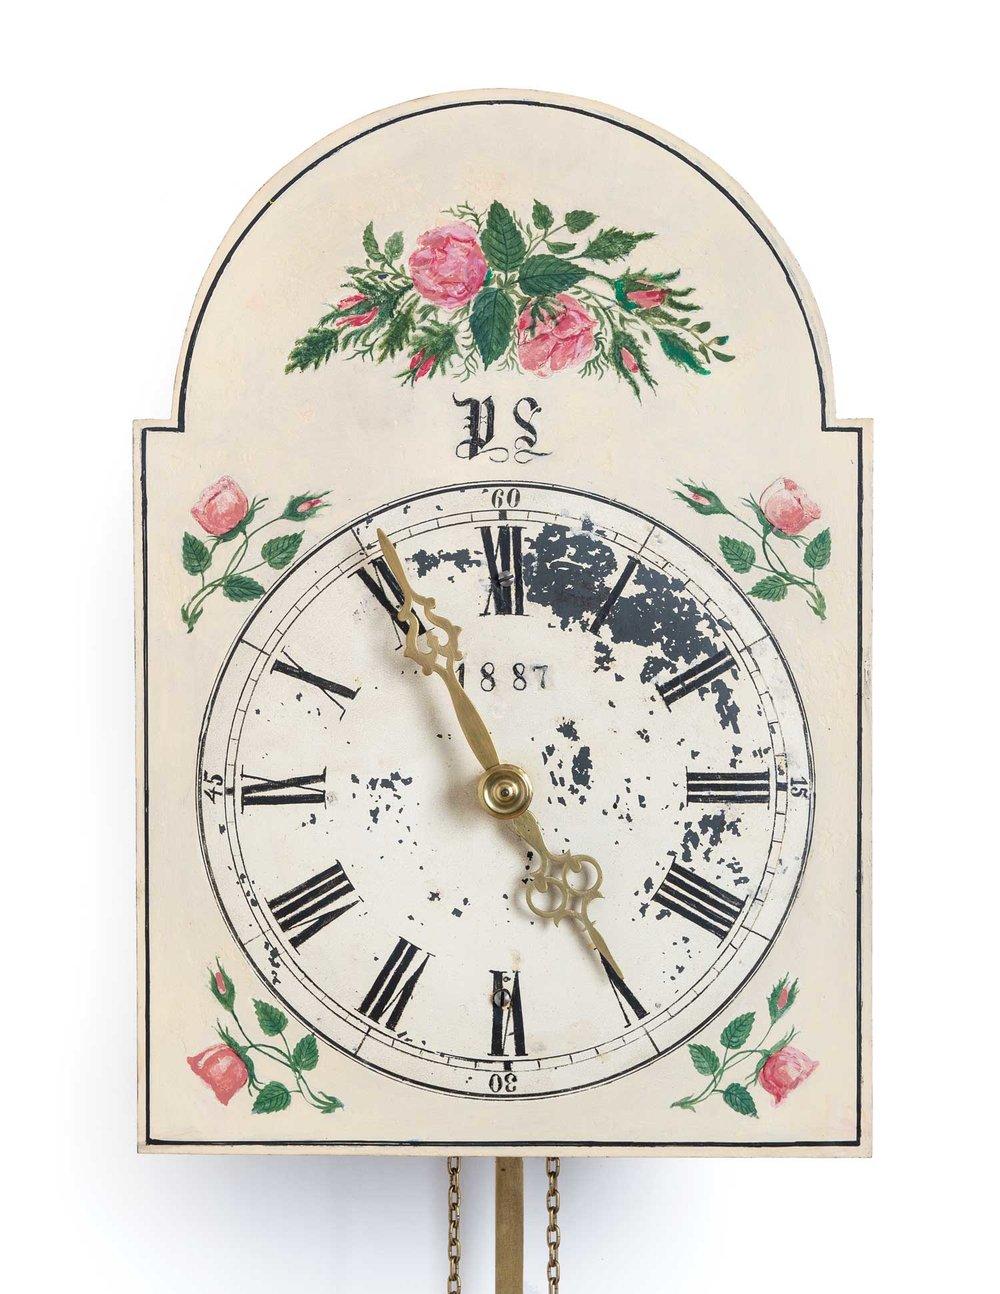 kroeger-clock-1887-mc0100.jpg